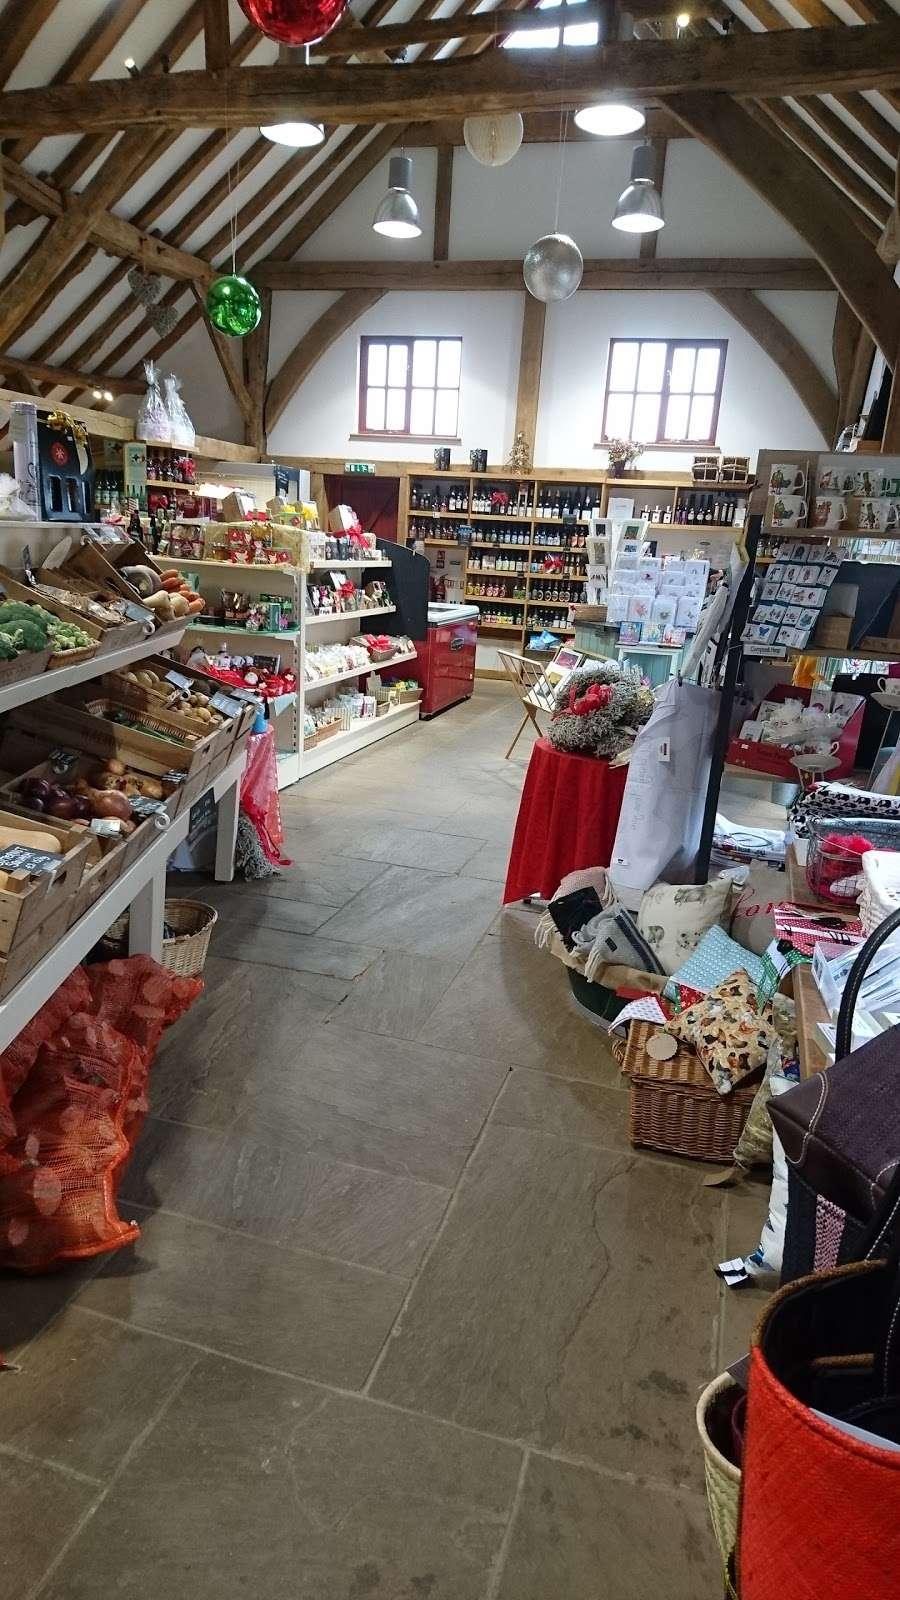 New House Farm Shop - cafe  | Photo 7 of 10 | Address: Old Crawley Rd, Faygate, Horsham RH12 4RU, UK | Phone: 01293 851890